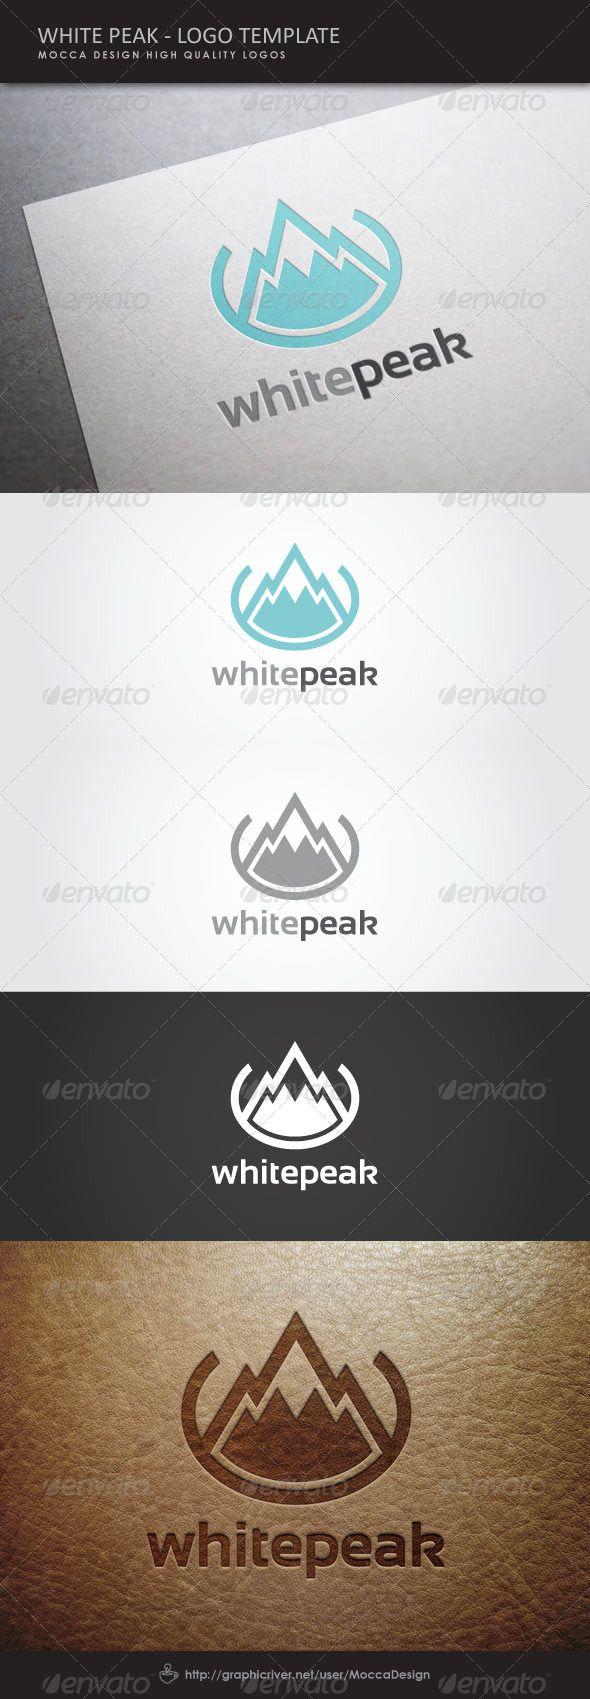 4 Color Versions: CMYK, Black, Grey & White